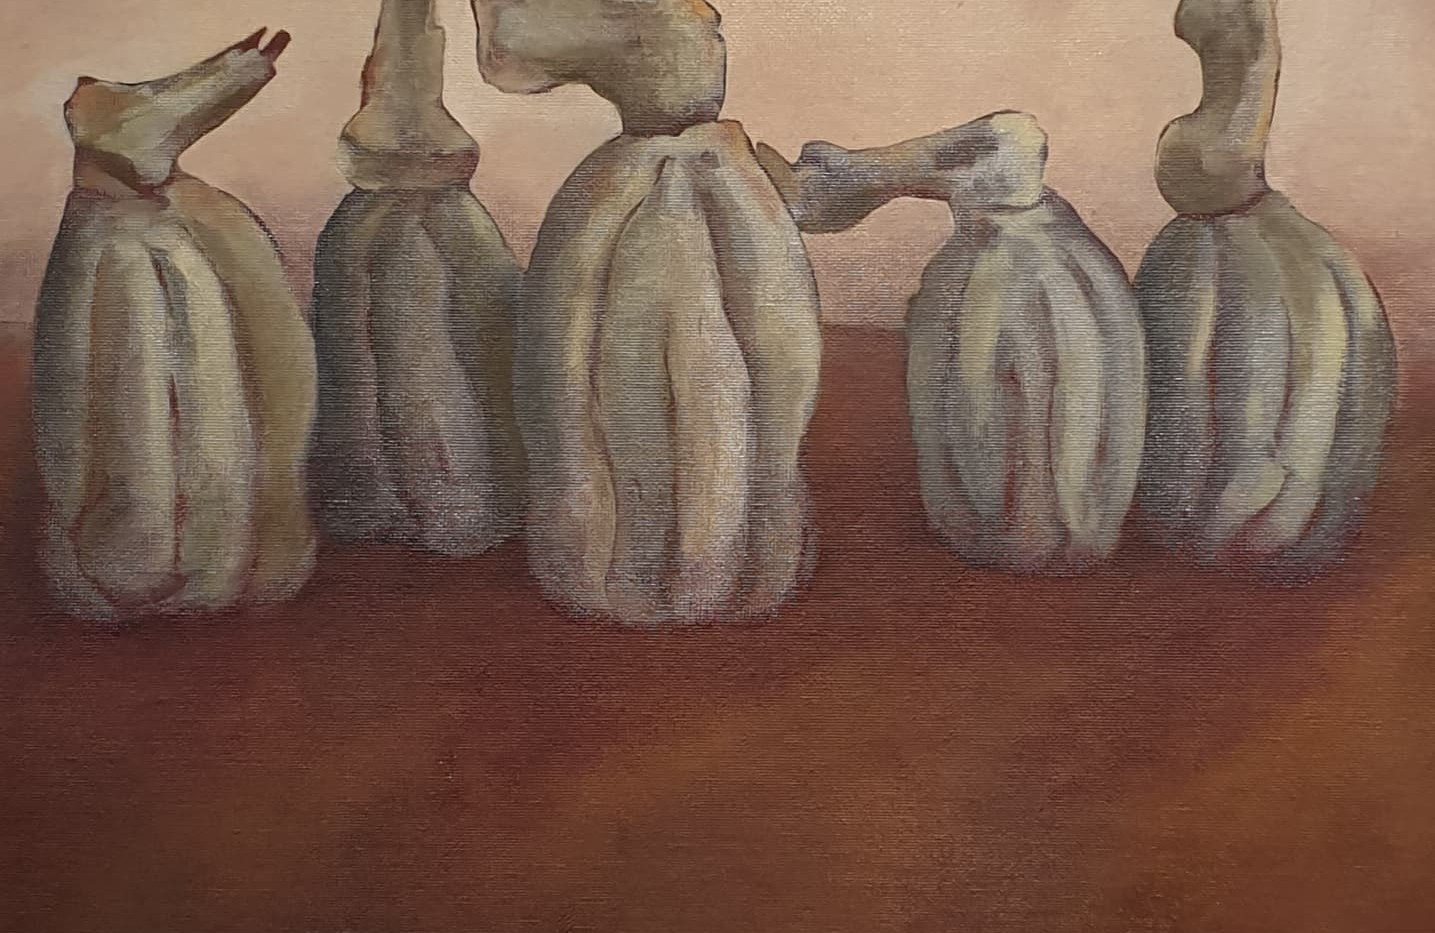 Woollybutts in Conversation, No. 2 || Angela Hayson